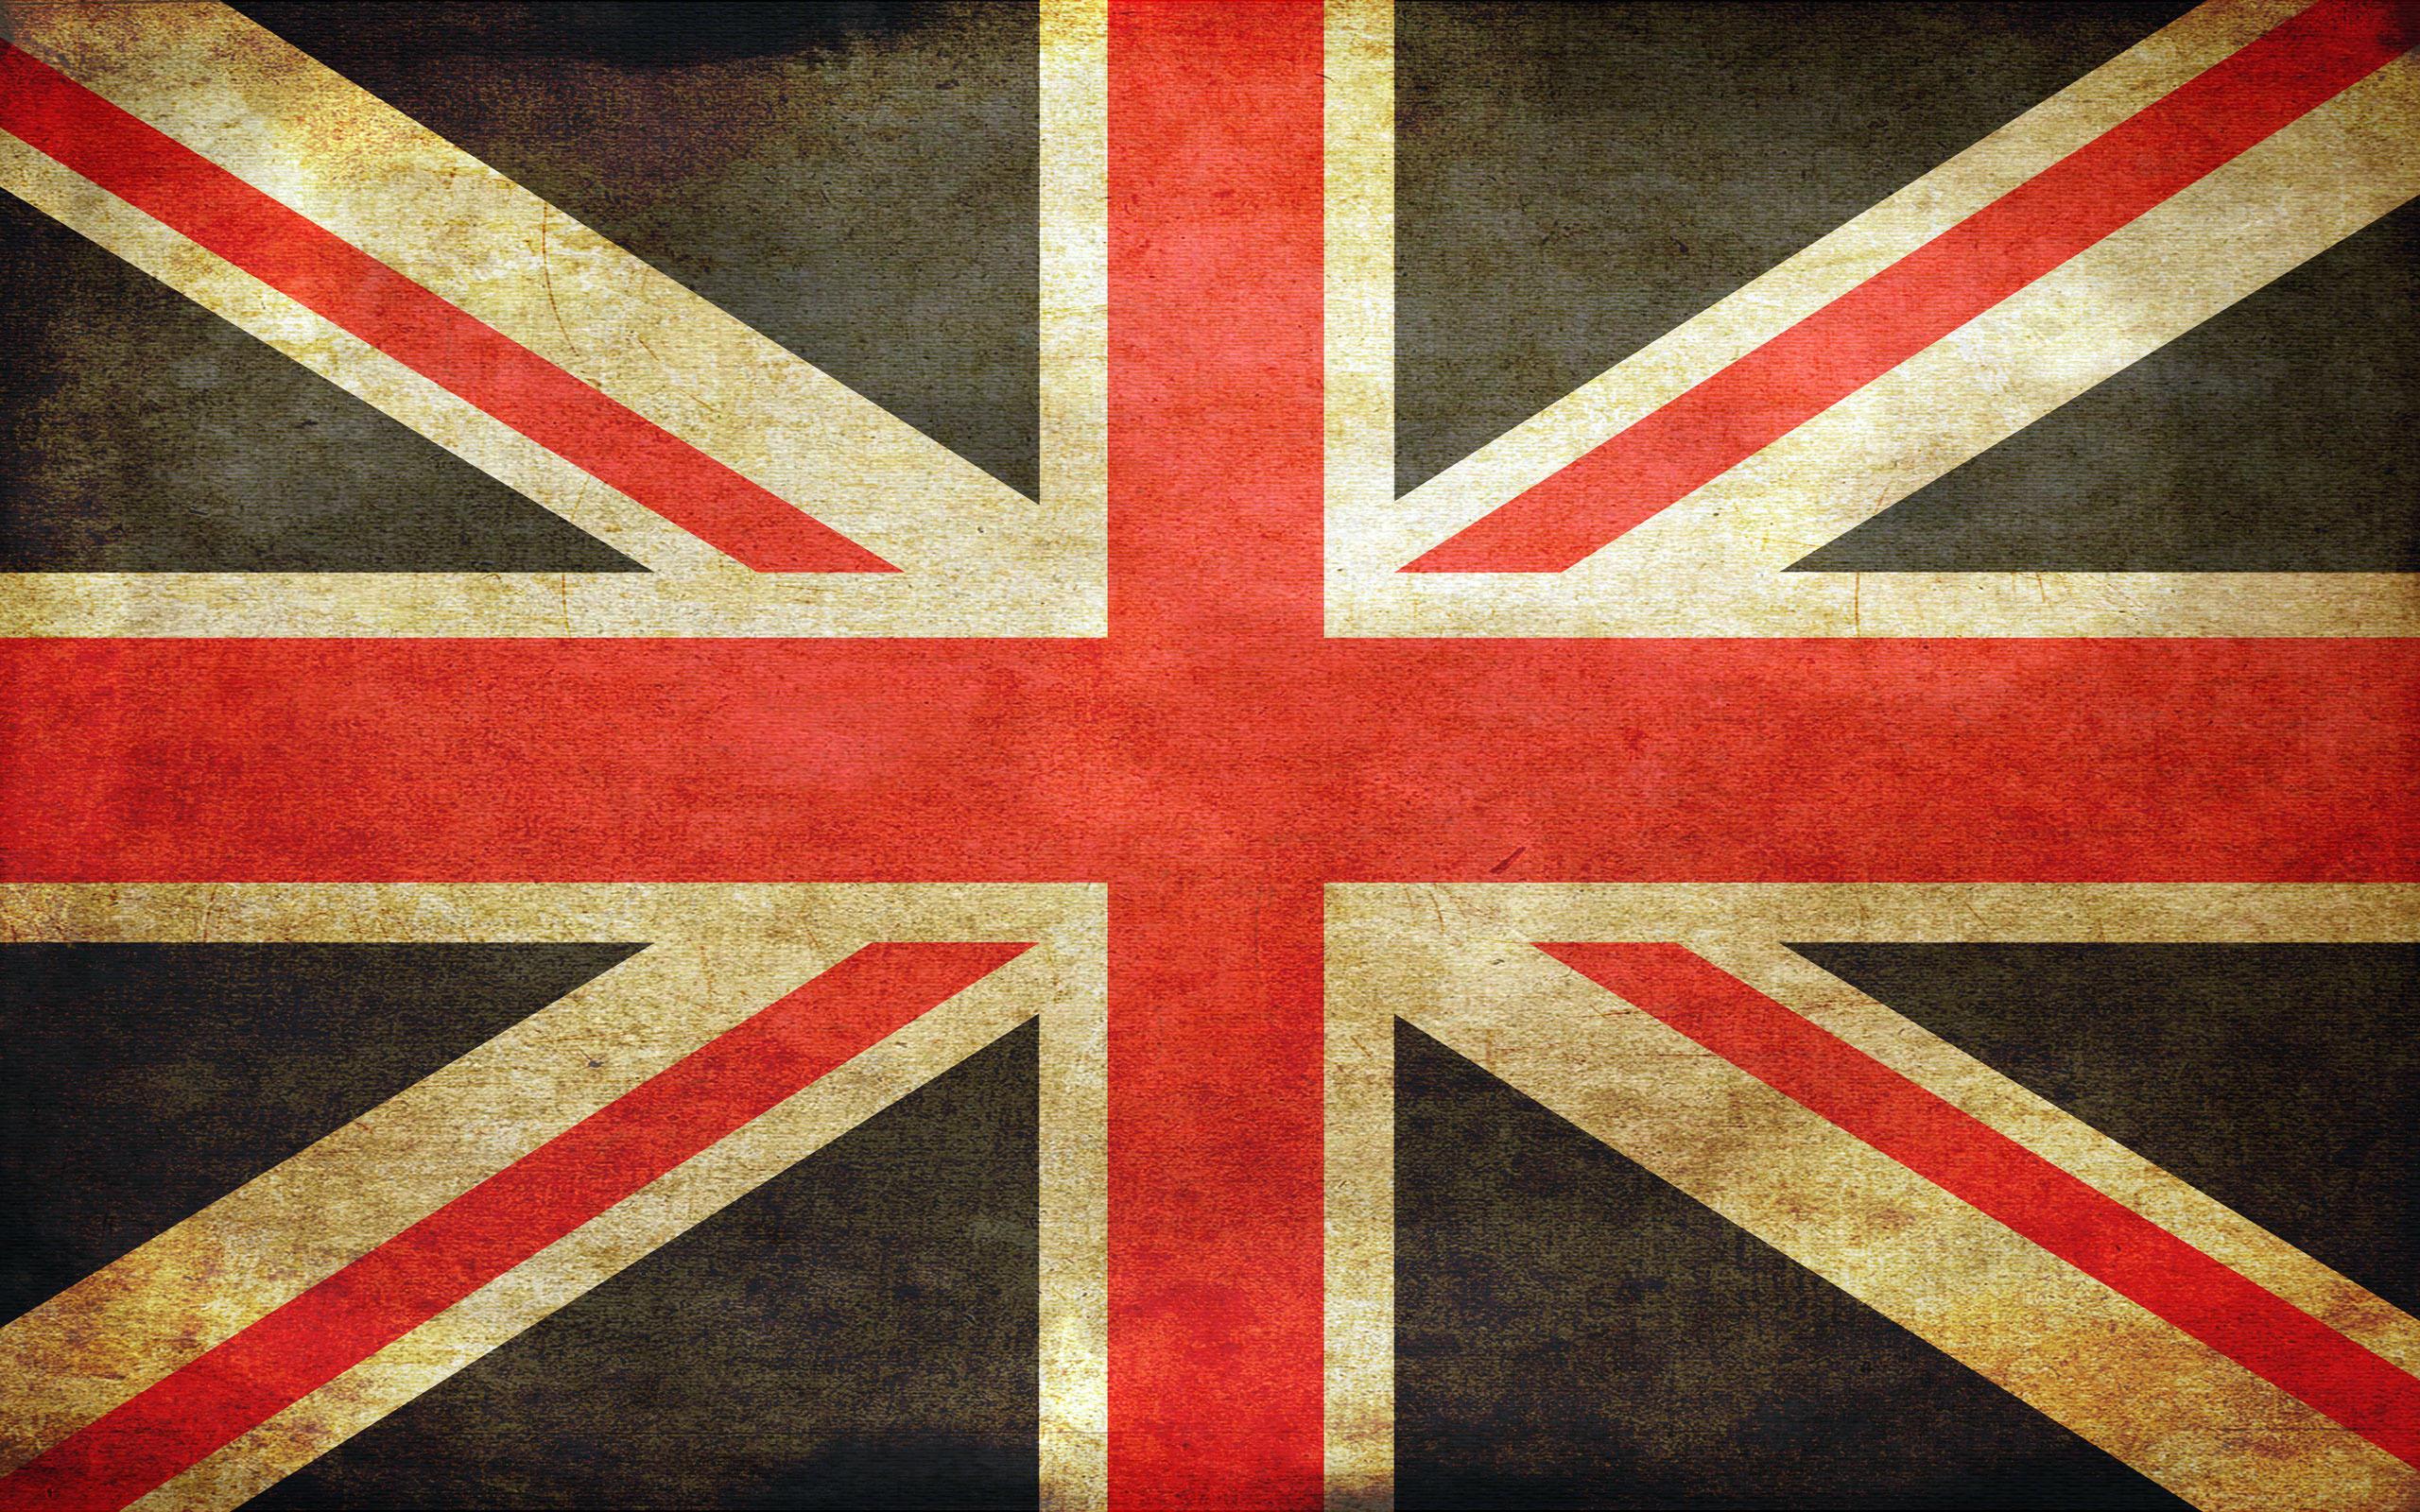 United Kingdom Flag Wallpaper 2560x1600